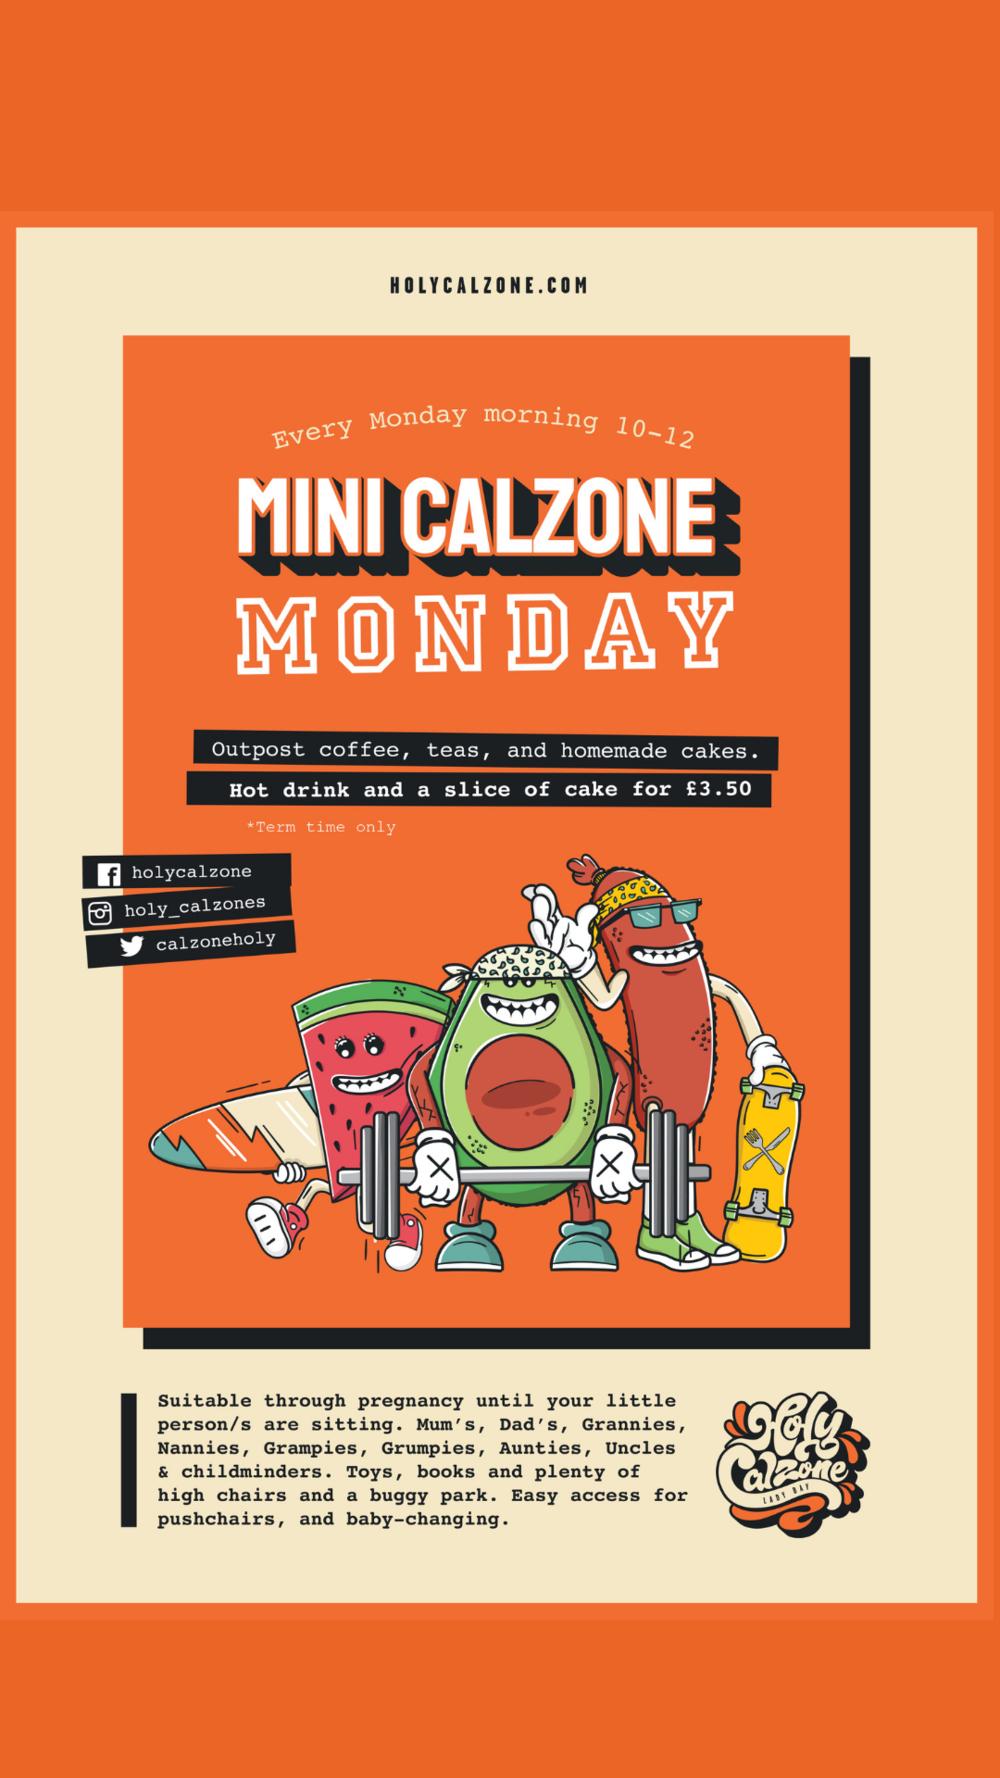 Mini Calzone Monday.png